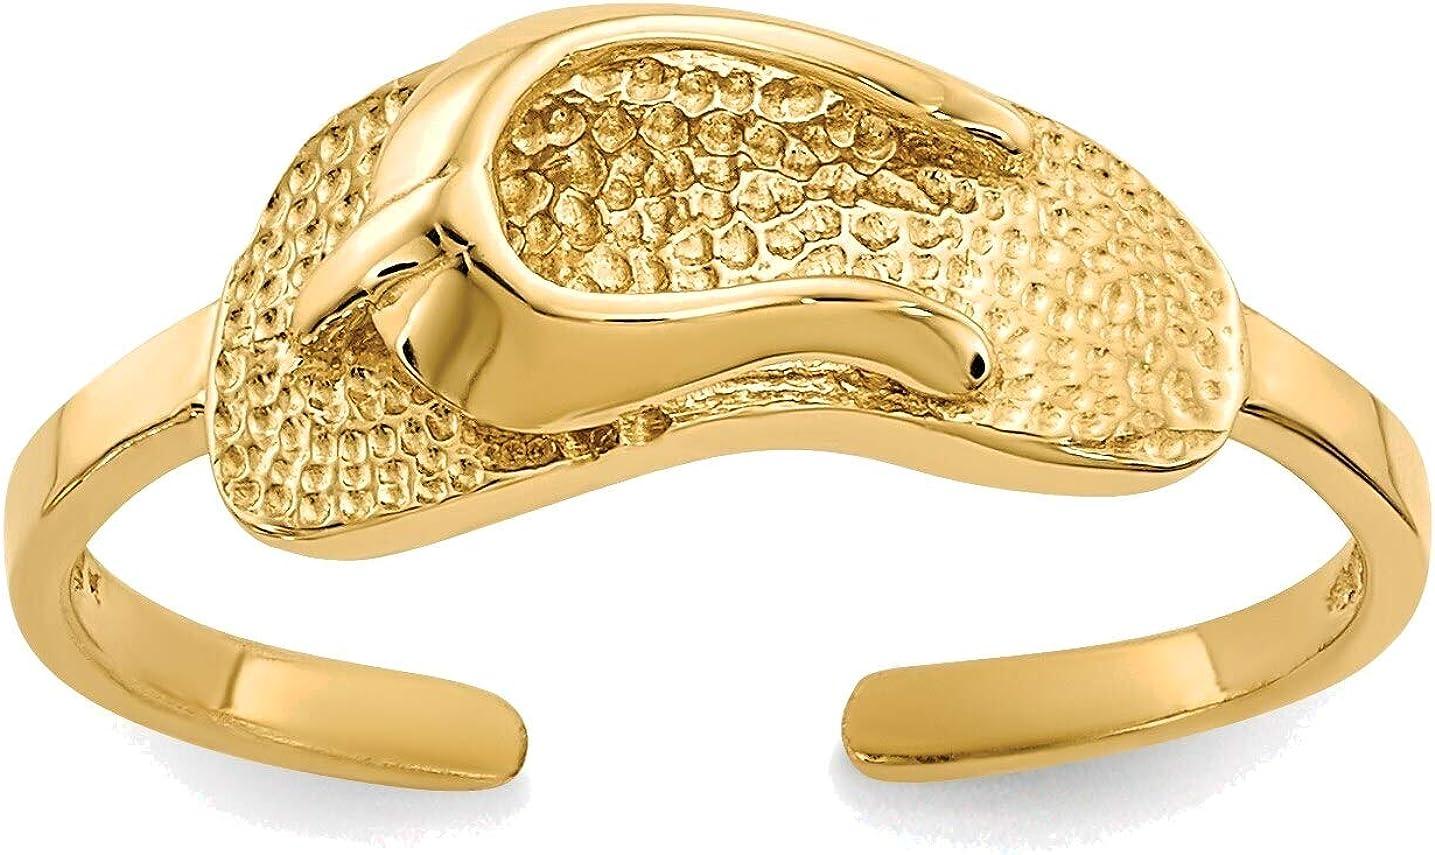 Bonyak Jewelry Sandal Toe Ring in 14K Yellow Gold in Size 11